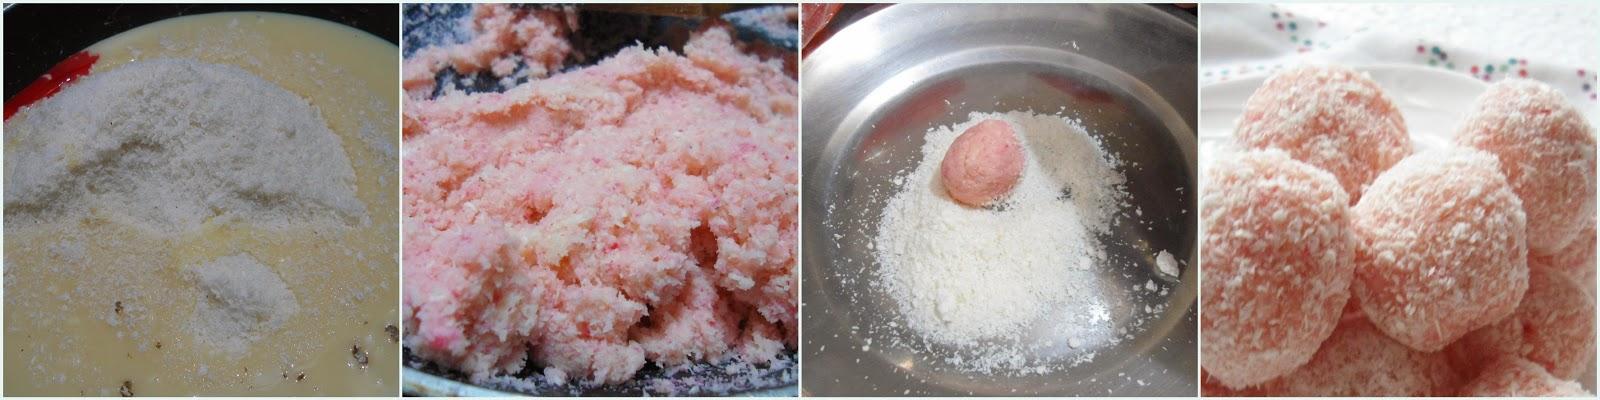 Rose flavored Coconut Balls   Rose Coconut Balls   Easy Sweet Recipe